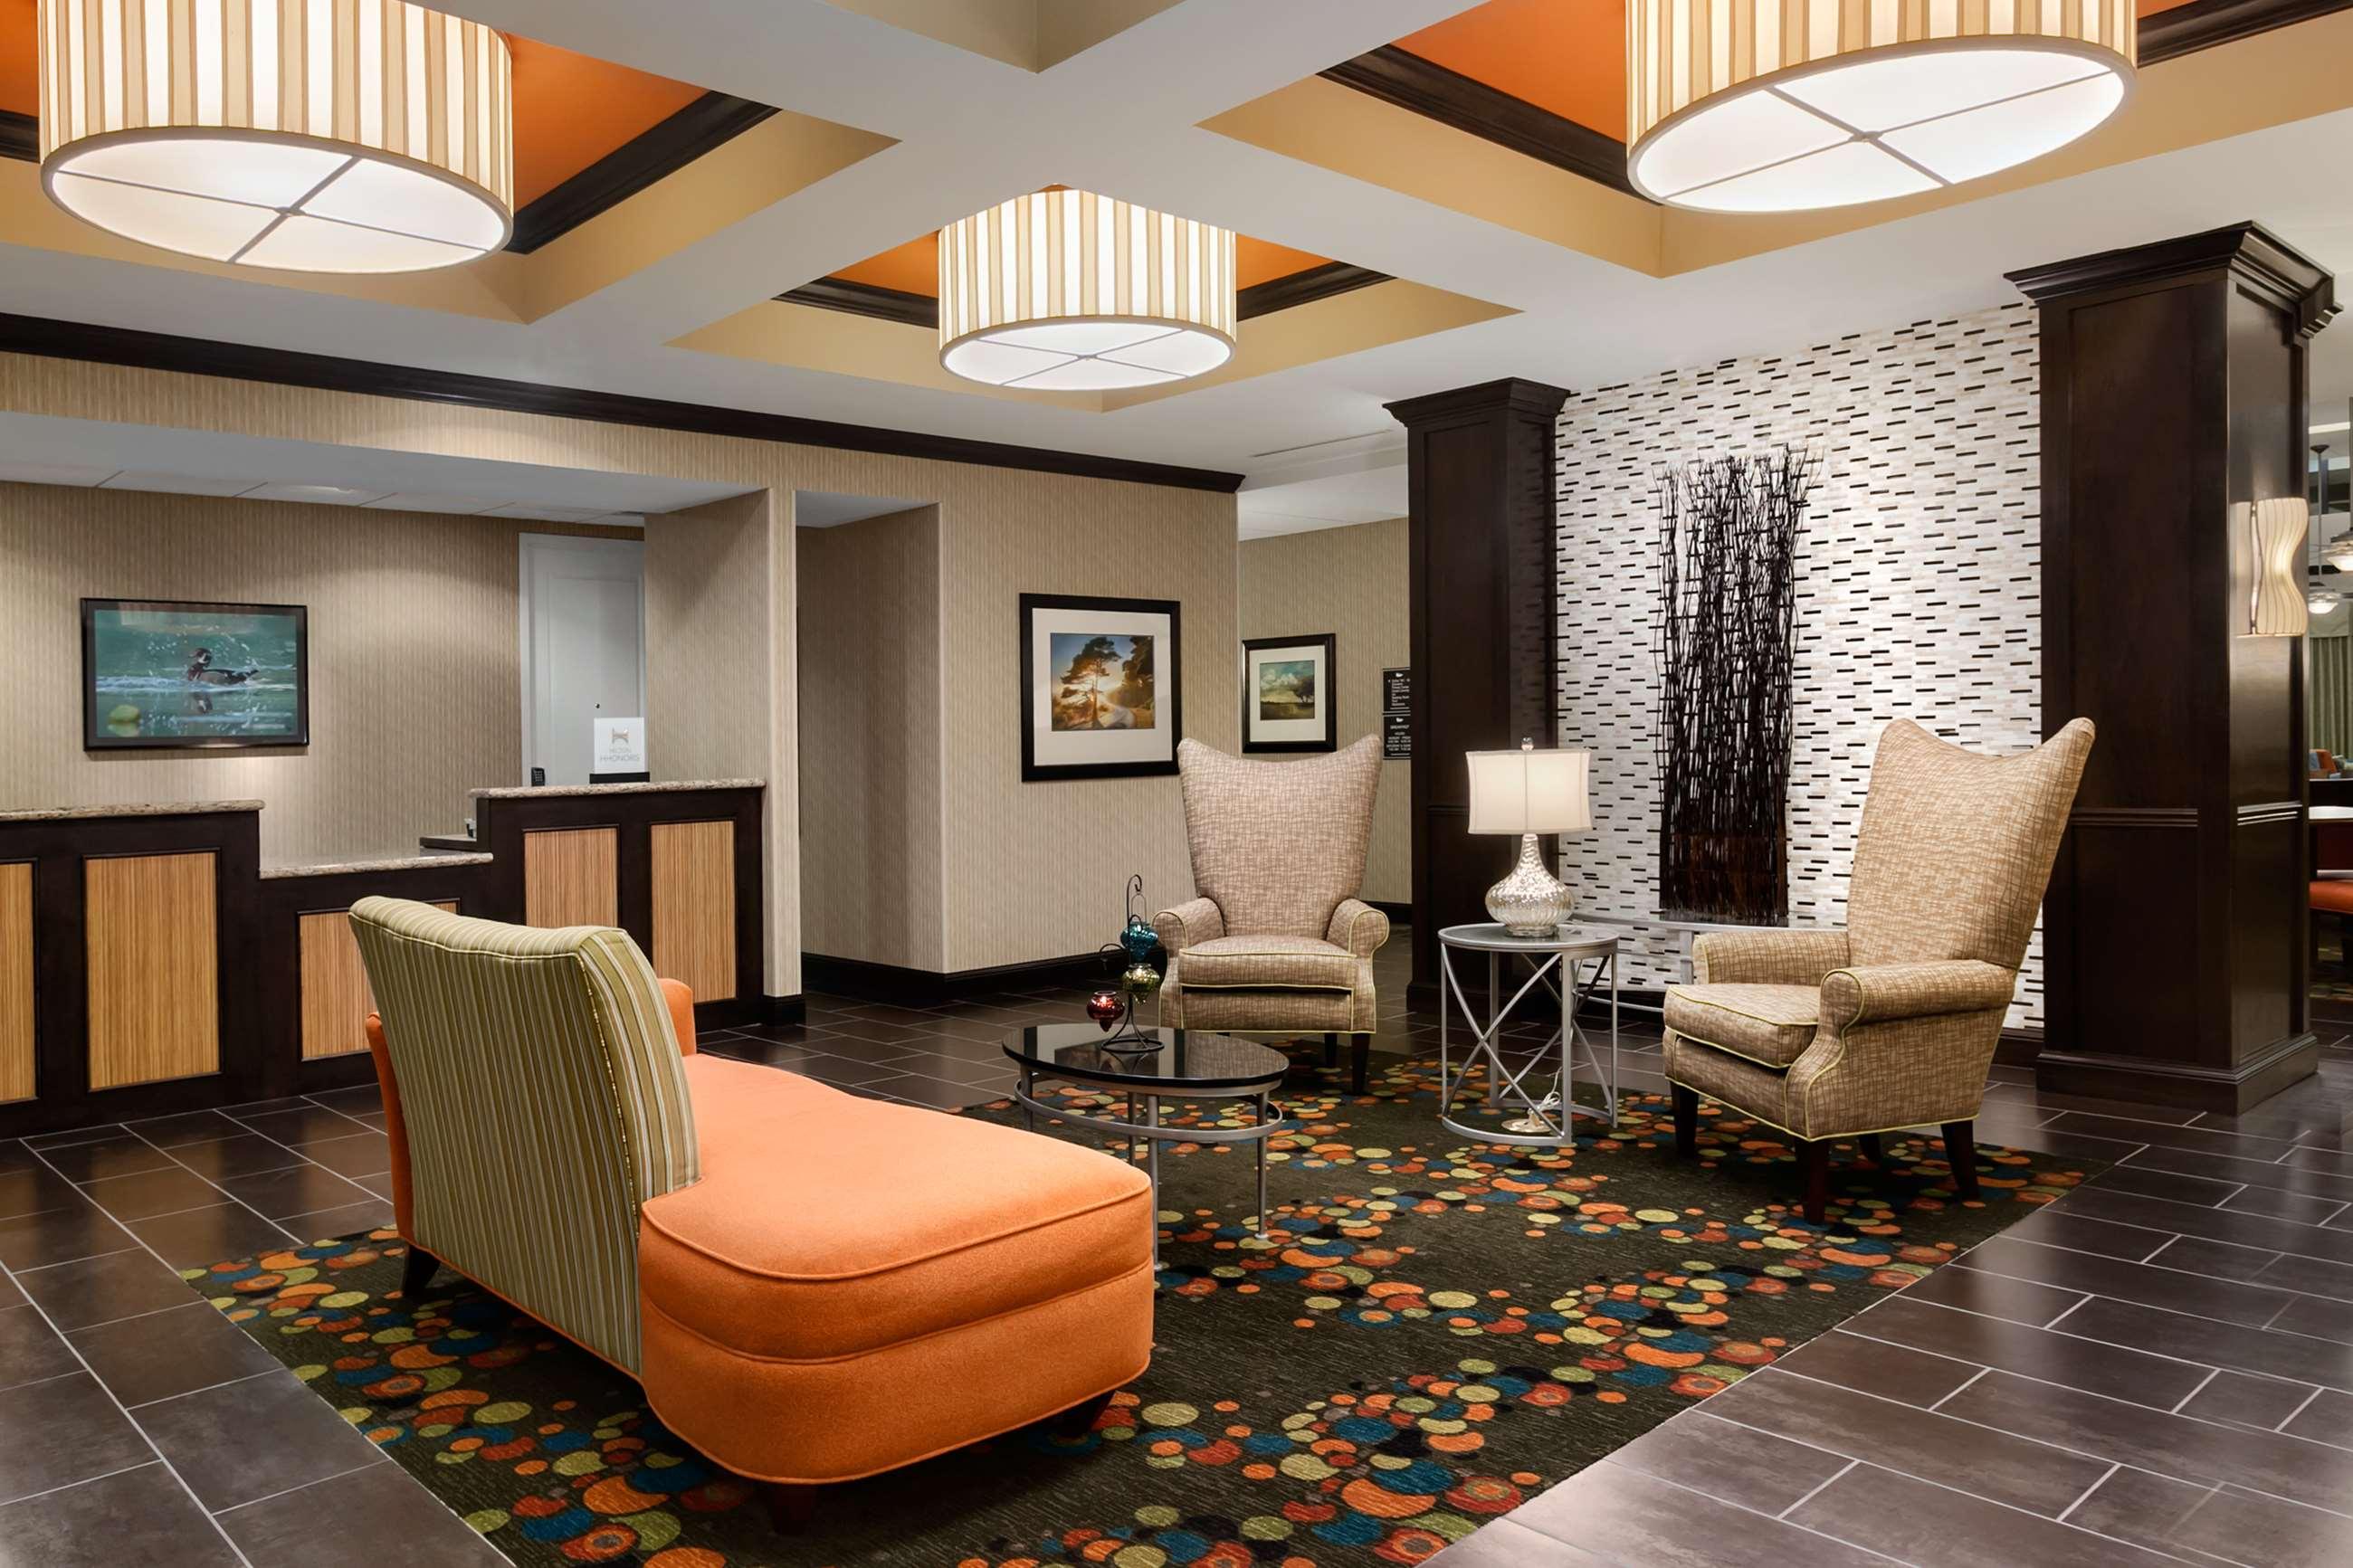 Homewood Suites by Hilton Joplin, MO image 1